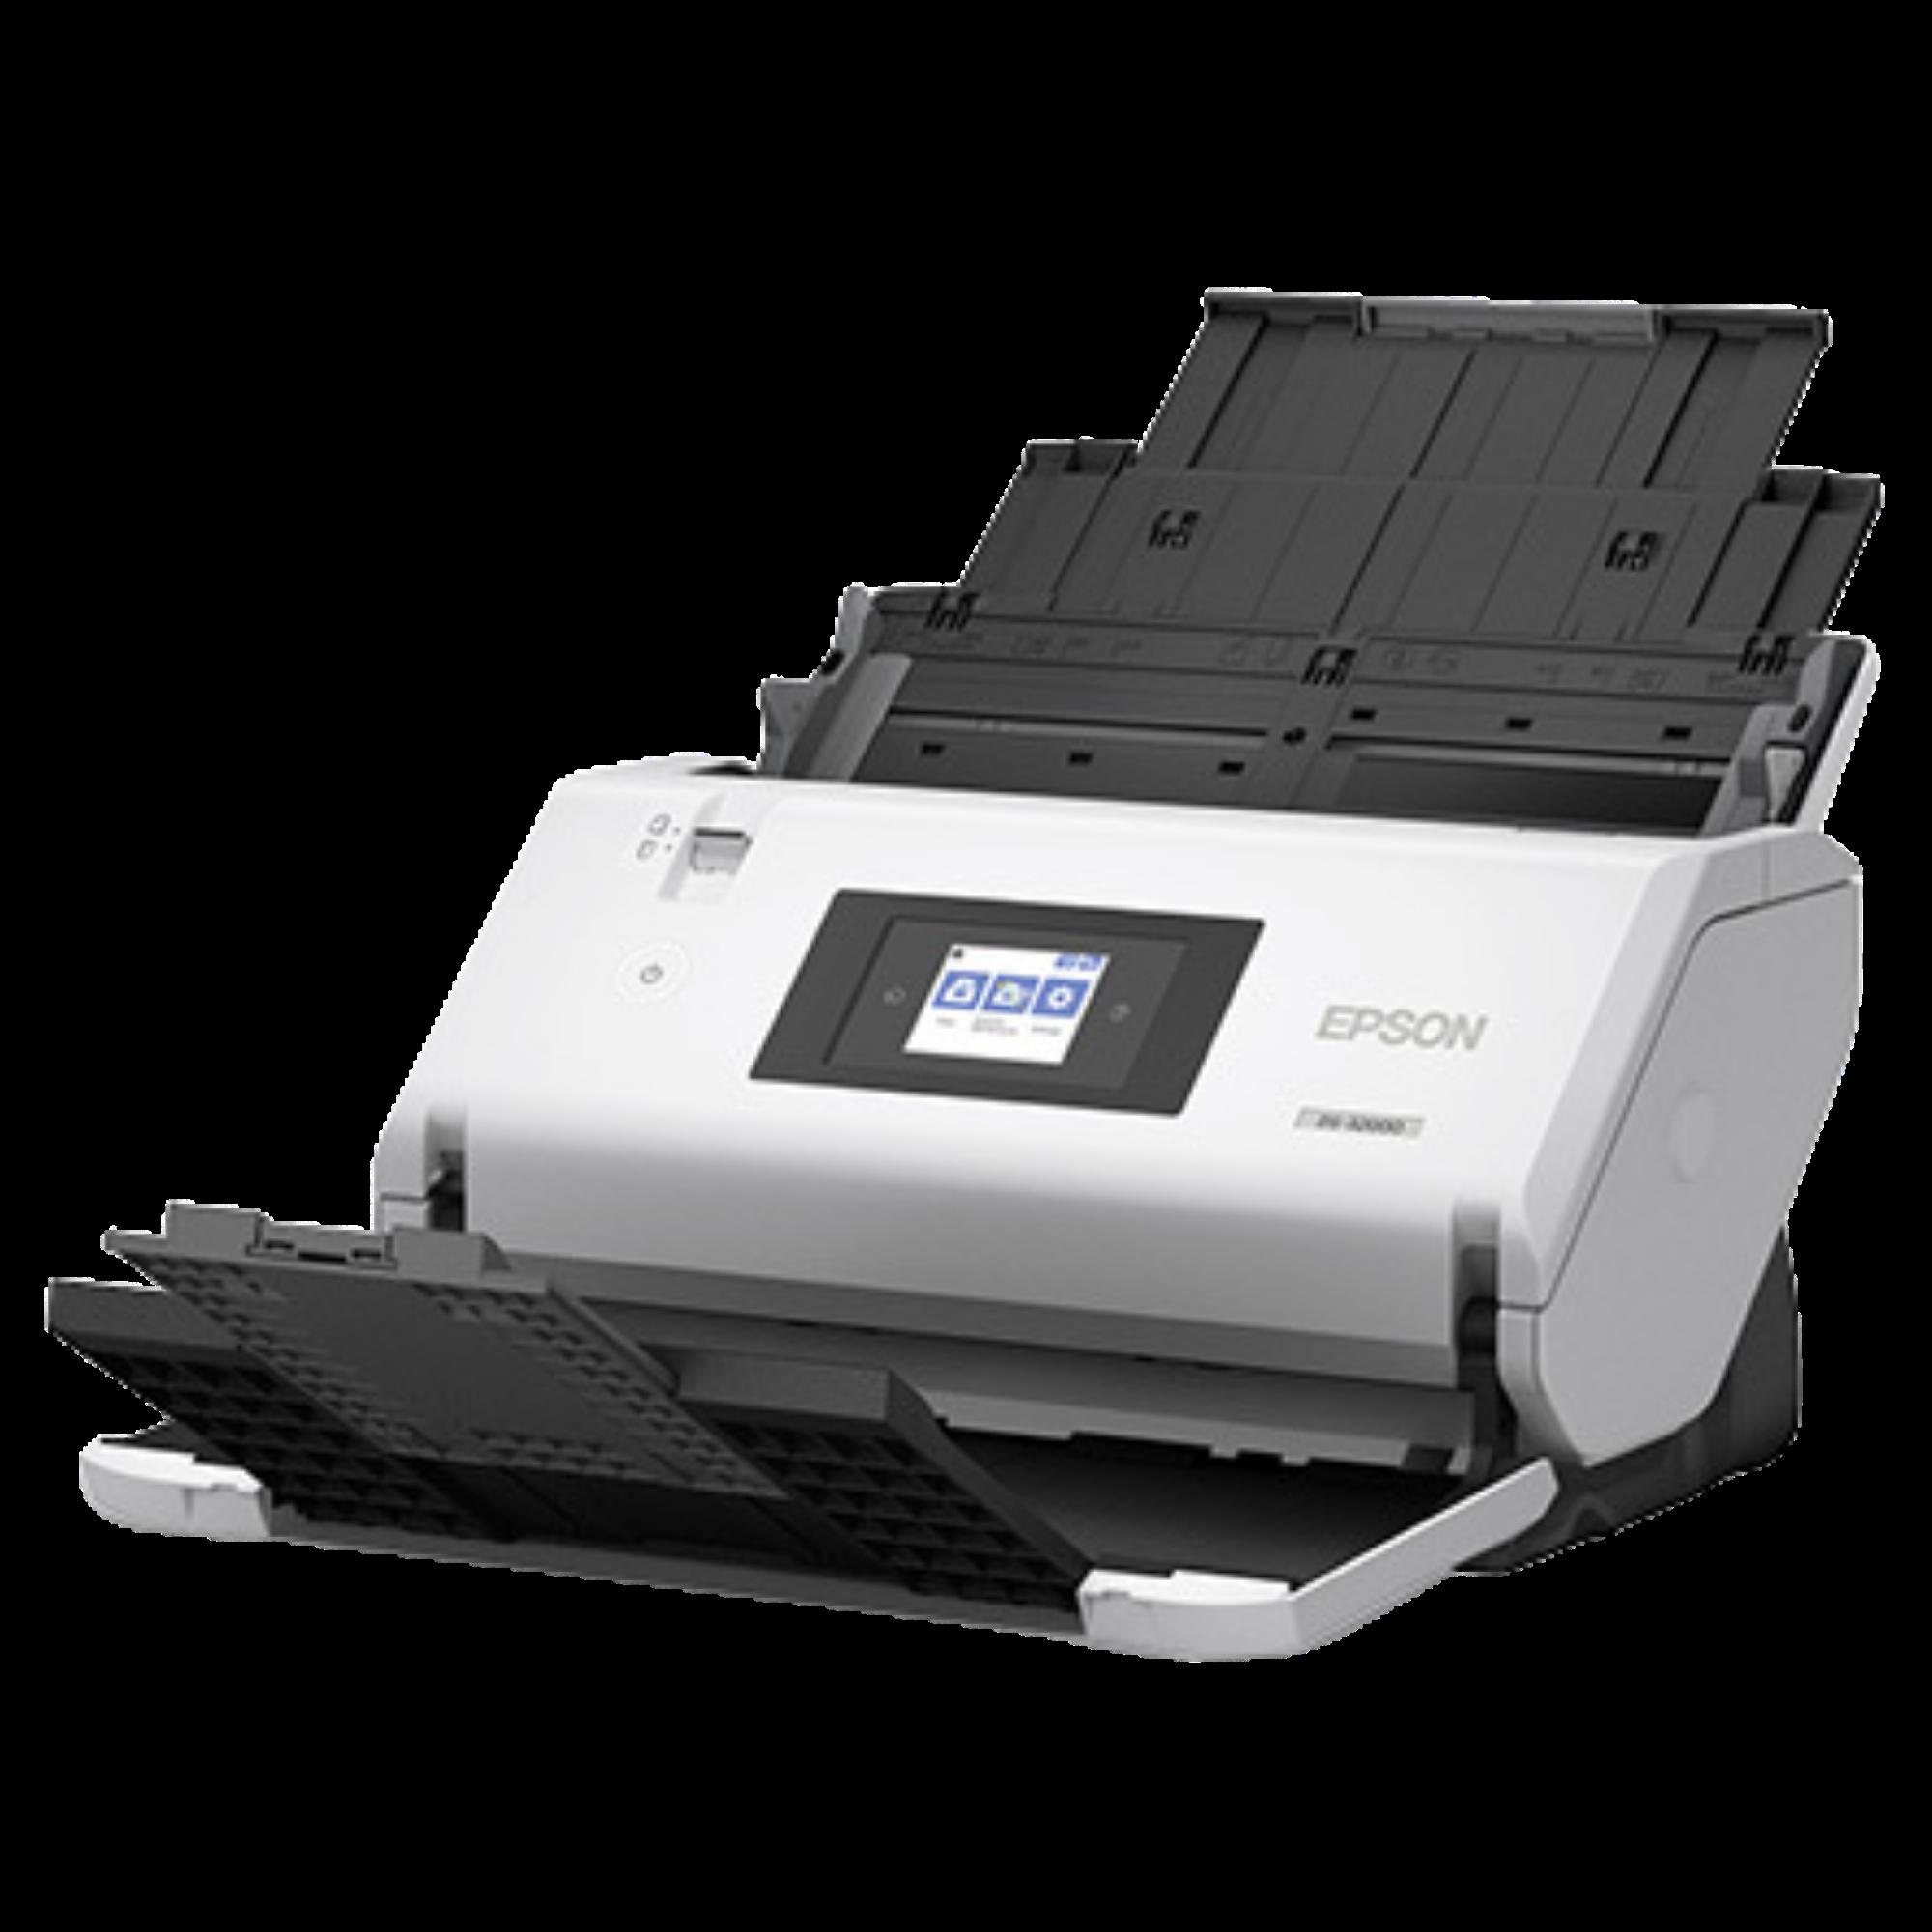 Epson DS-32000 90ppm 12x200